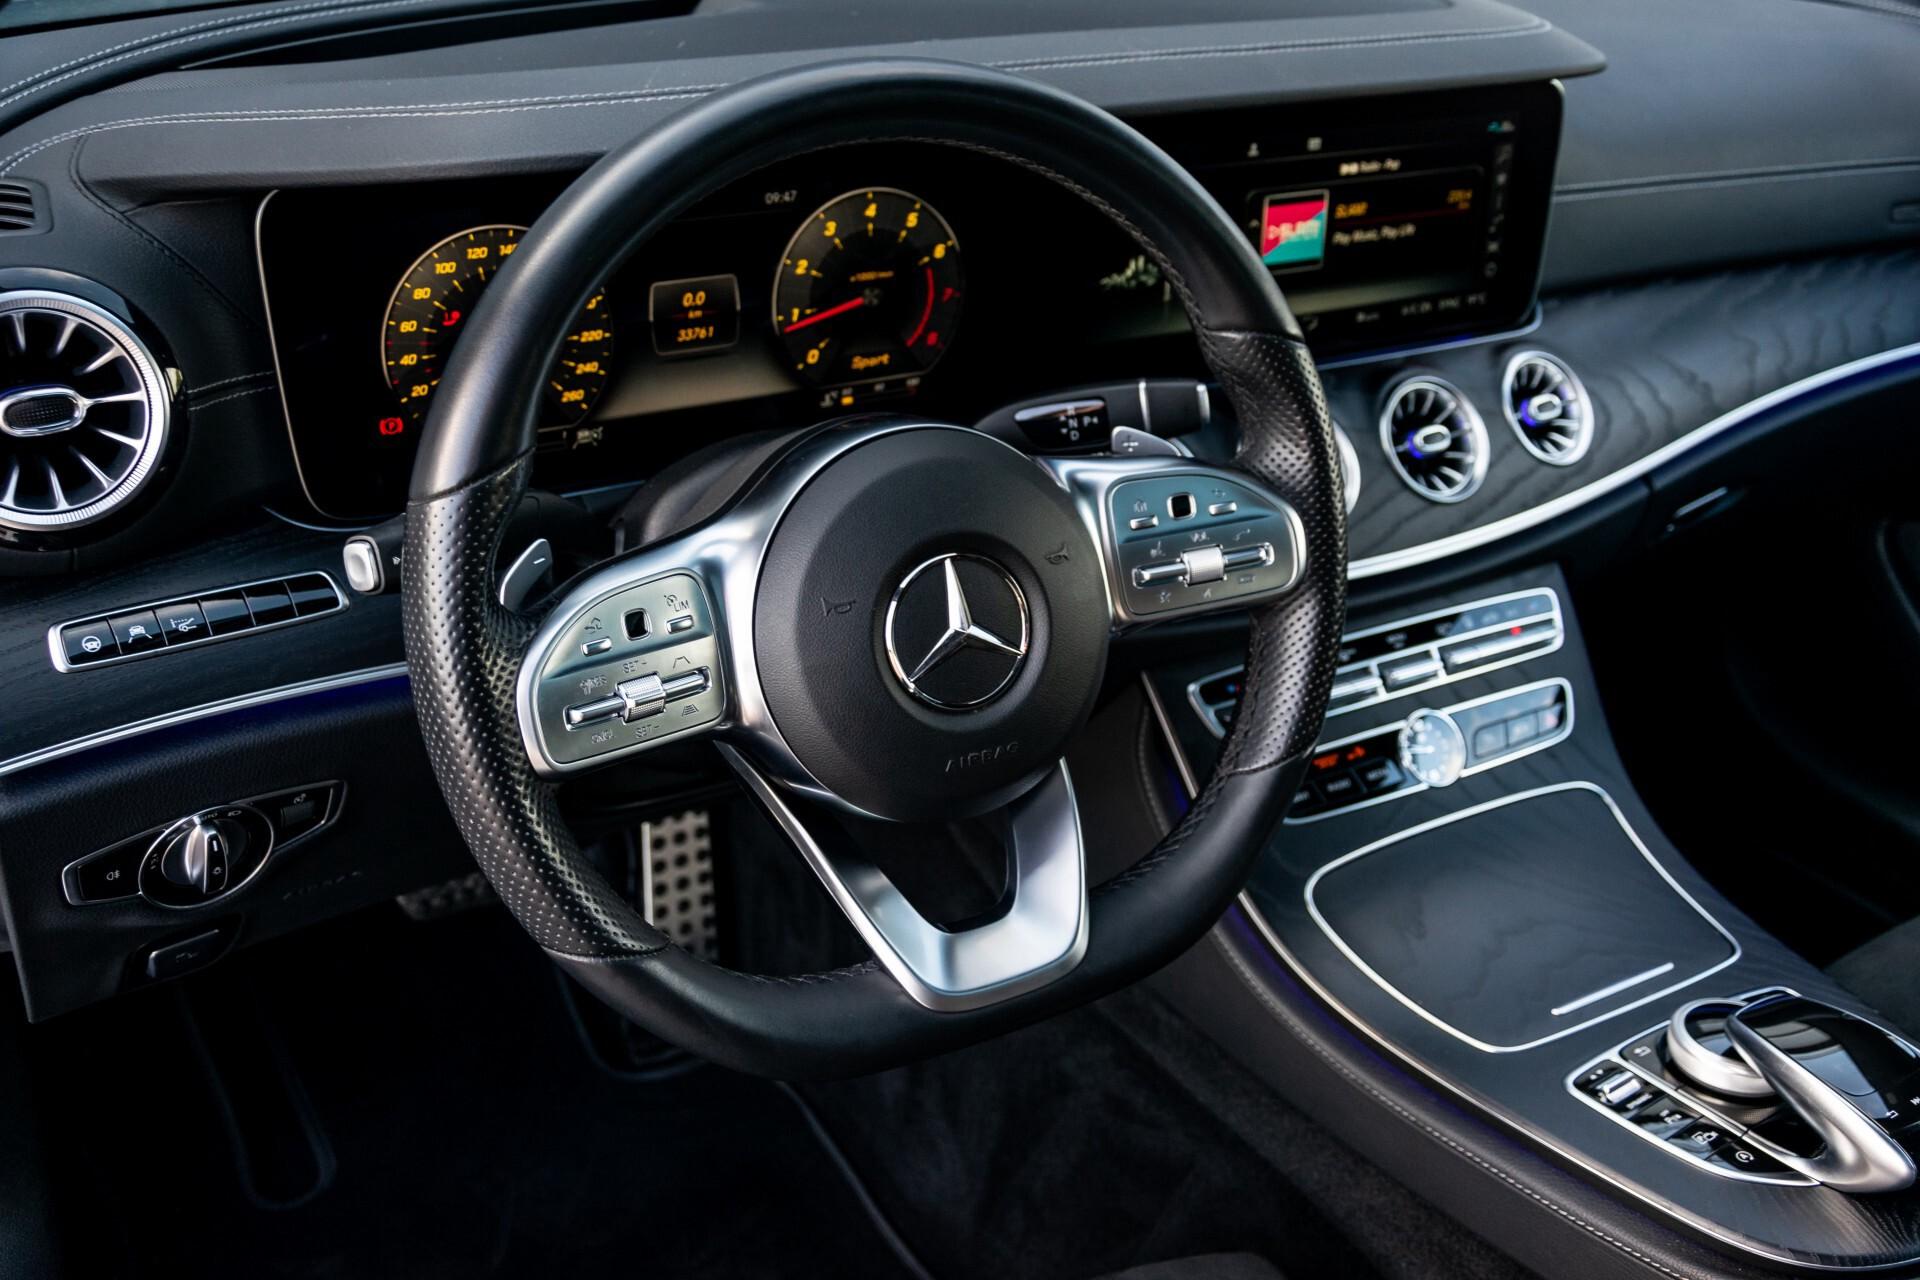 Mercedes-Benz E-Klasse Coupé 300 AMG Panorama/Rij-assist/Keyless/Massage/Memory/HUD/Standkachel/Night Aut9 Foto 17